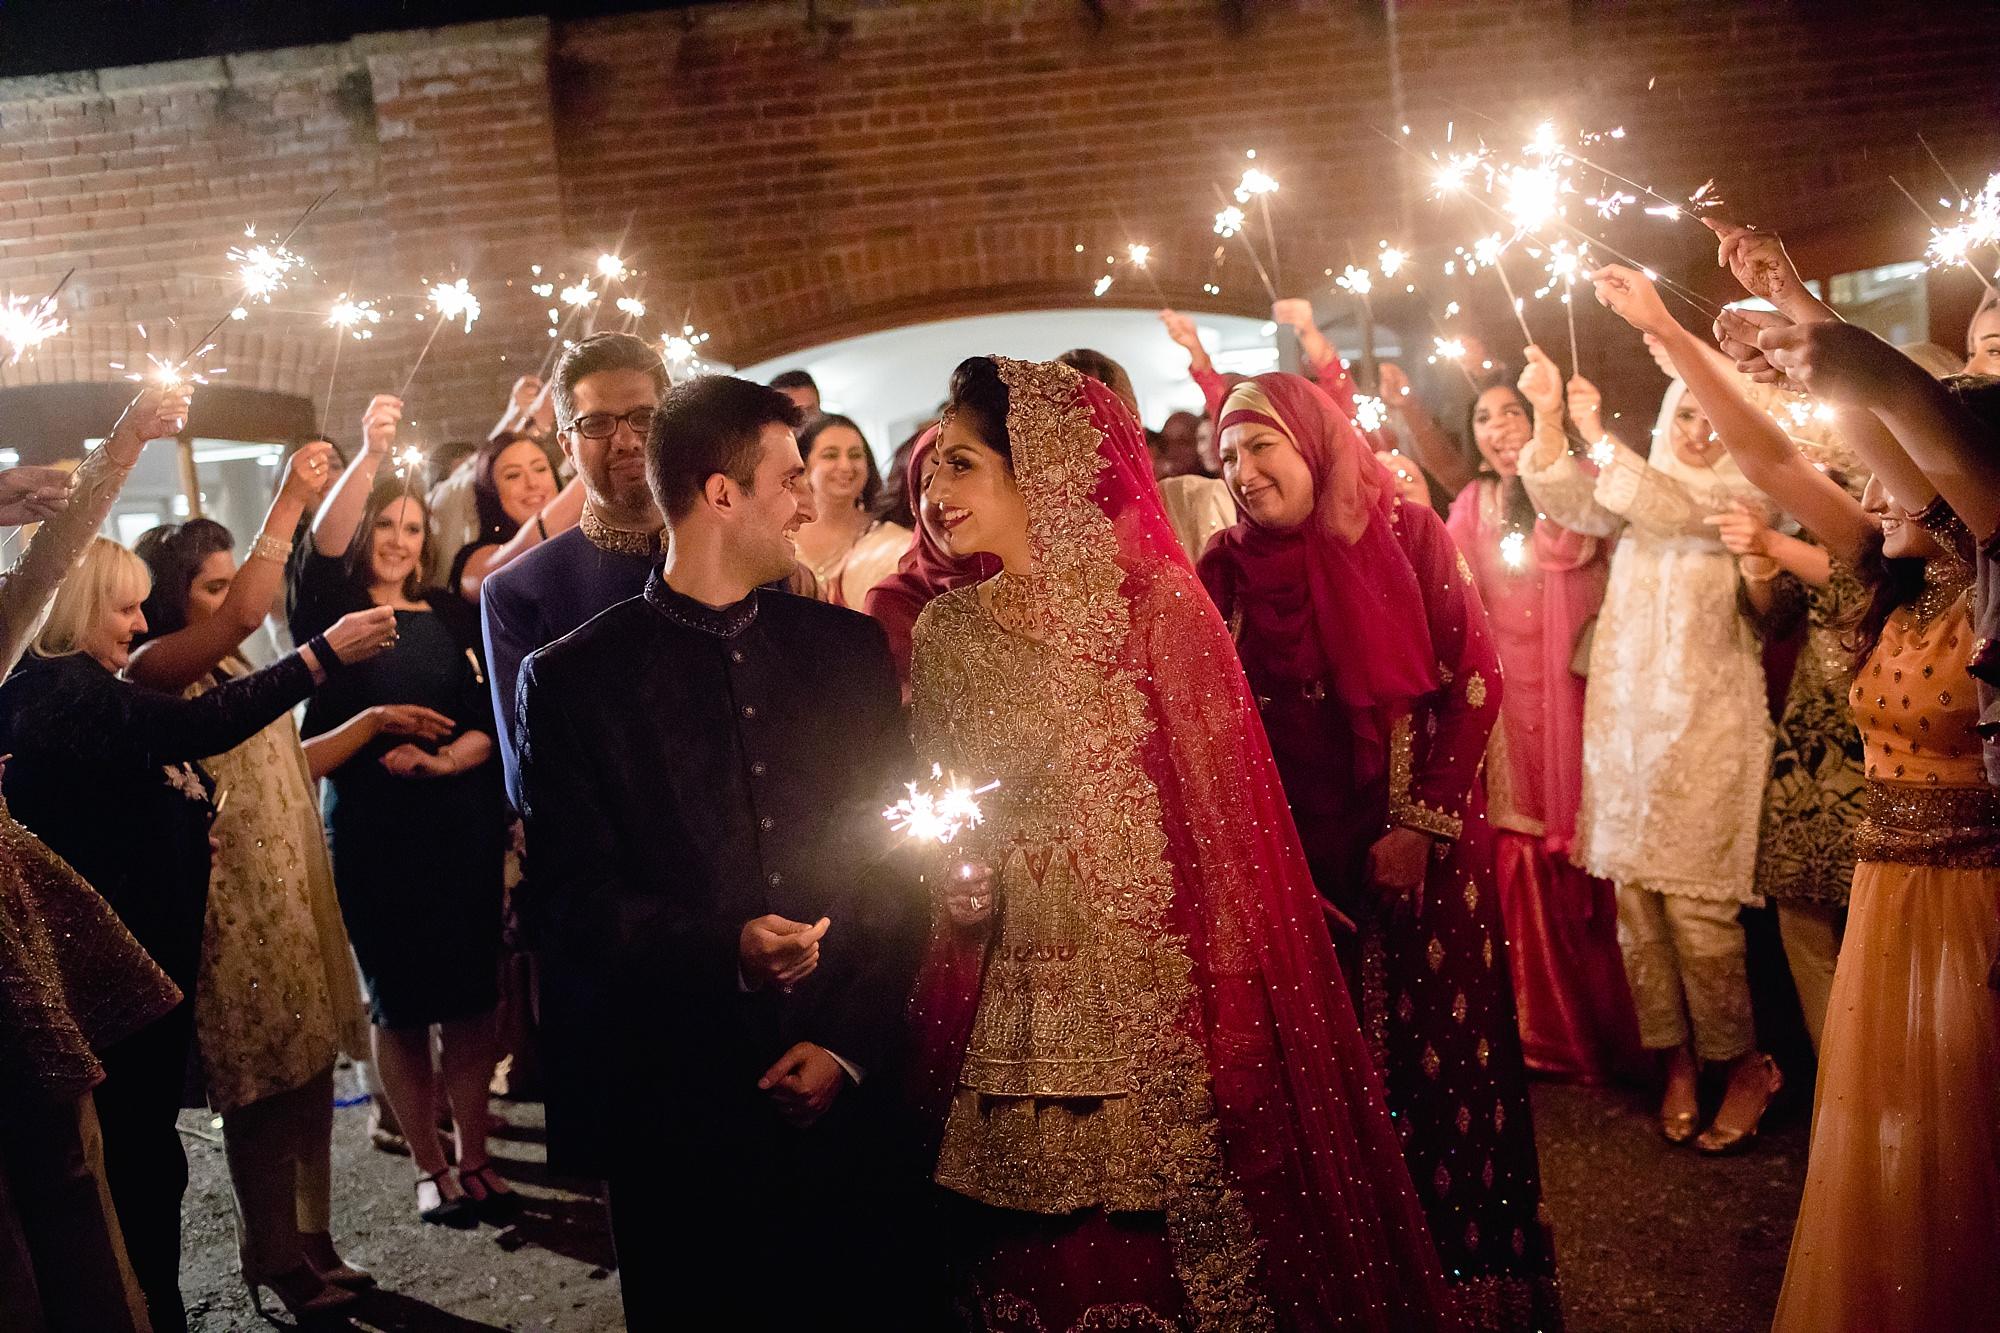 Pakistani Bride sparkler exit rukhsati at Tatton Park wedding Cheshire